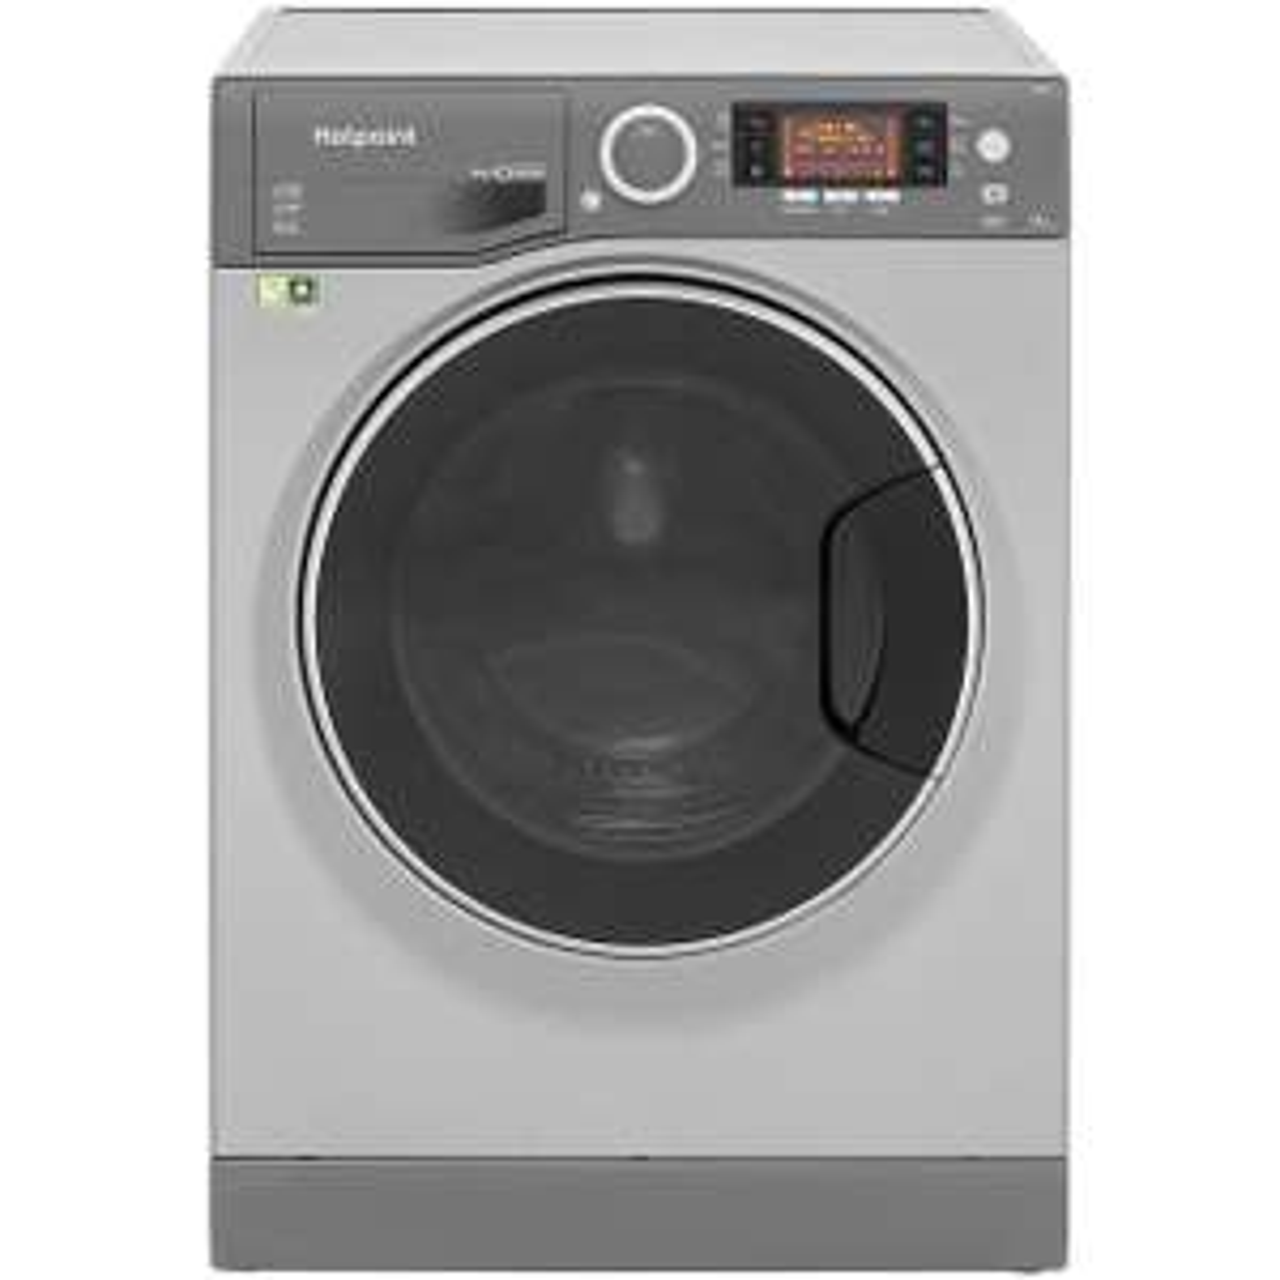 Hotpoint Ultima RD966JGD Washer Dryer (Price match + Voucher code) AO.com - £377